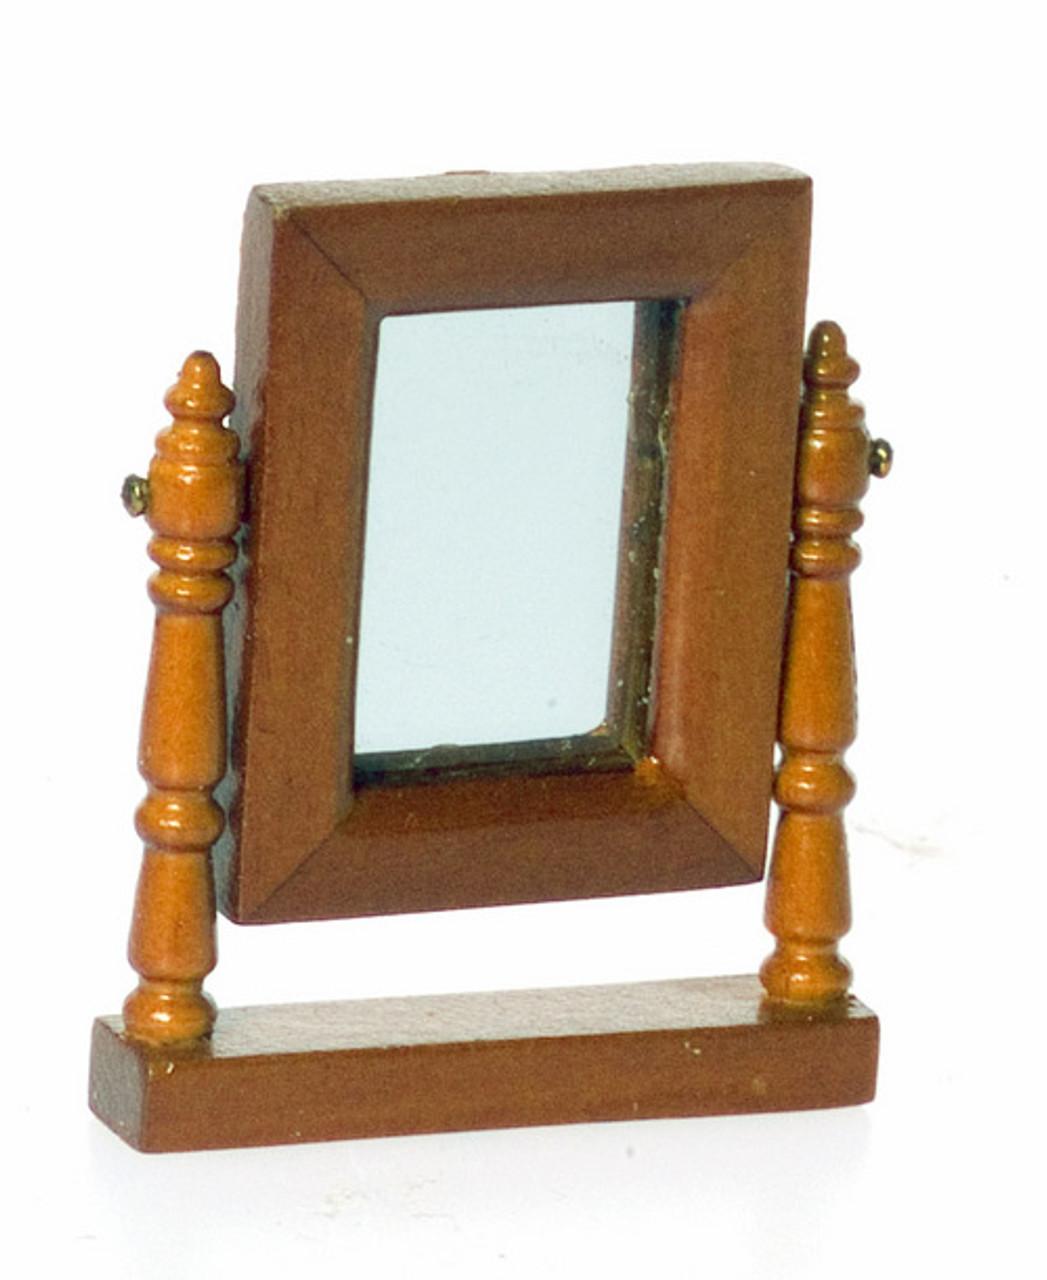 Lincoln Dresser Mirror - Walnut